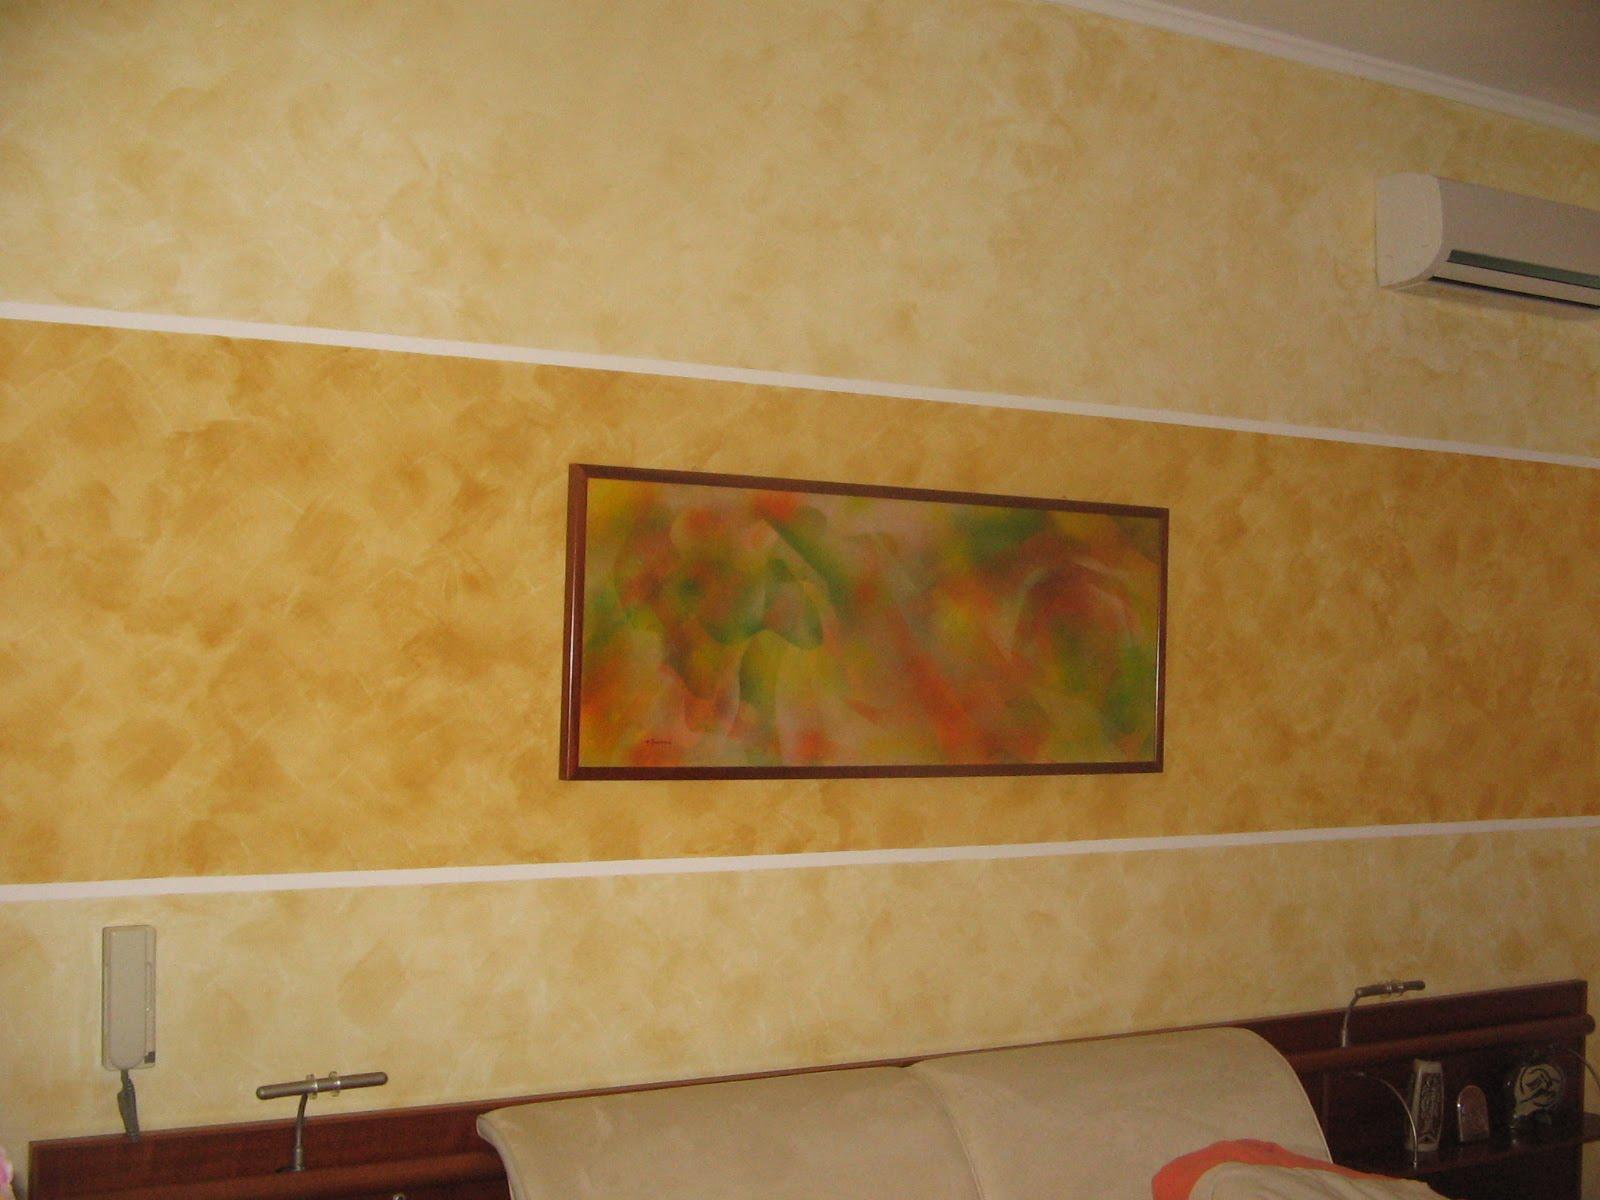 Verniciatura muri interni xq88 regardsdefemmes - Vernice plastica per muri esterni ...